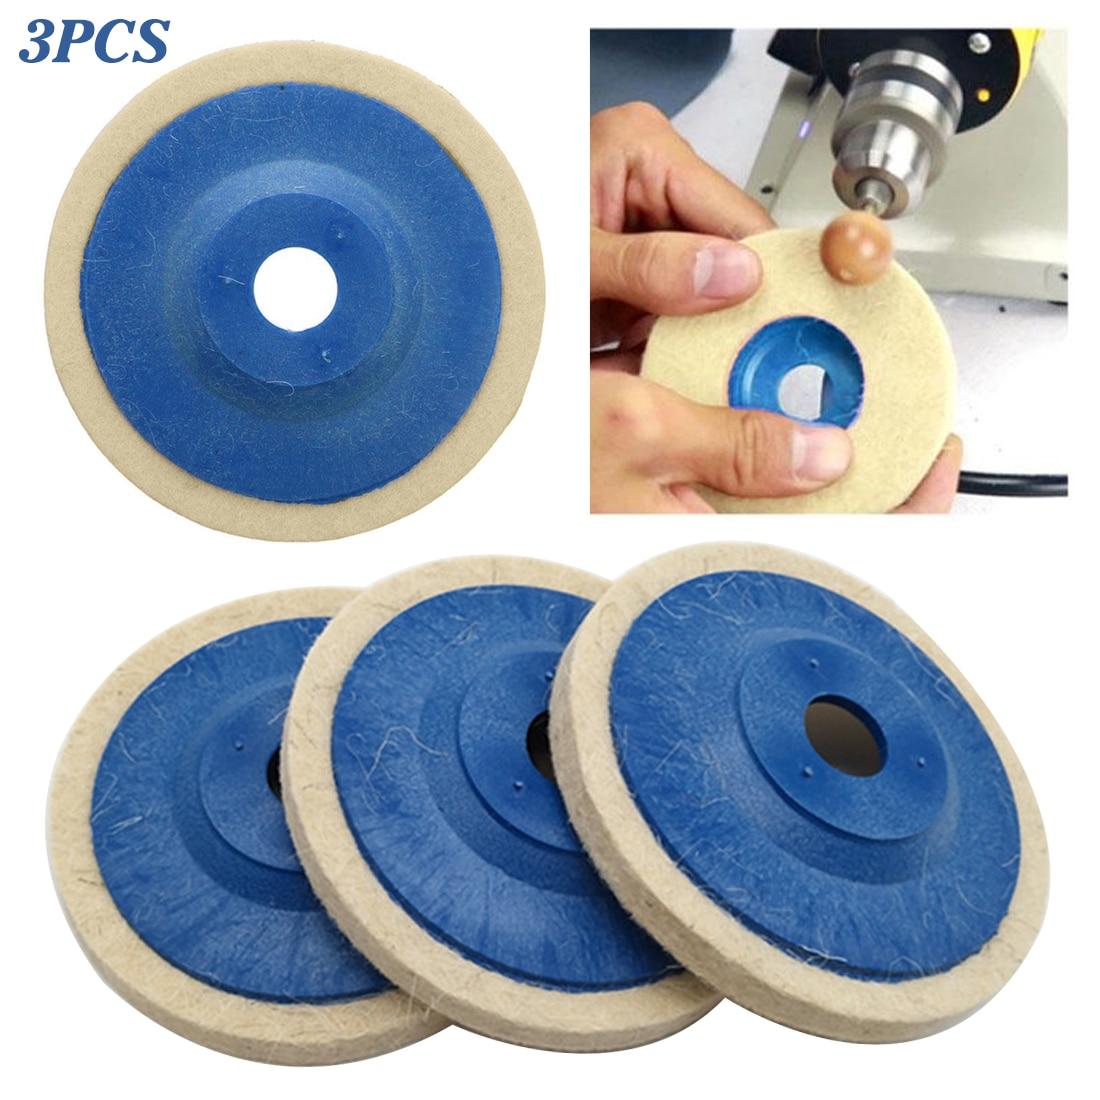 100mm Wool Polishing Wheel Buffing Pads Angle Grinder Wheel Felt Polishing Disc For Metal Marble Glass Ceramics 3PCS